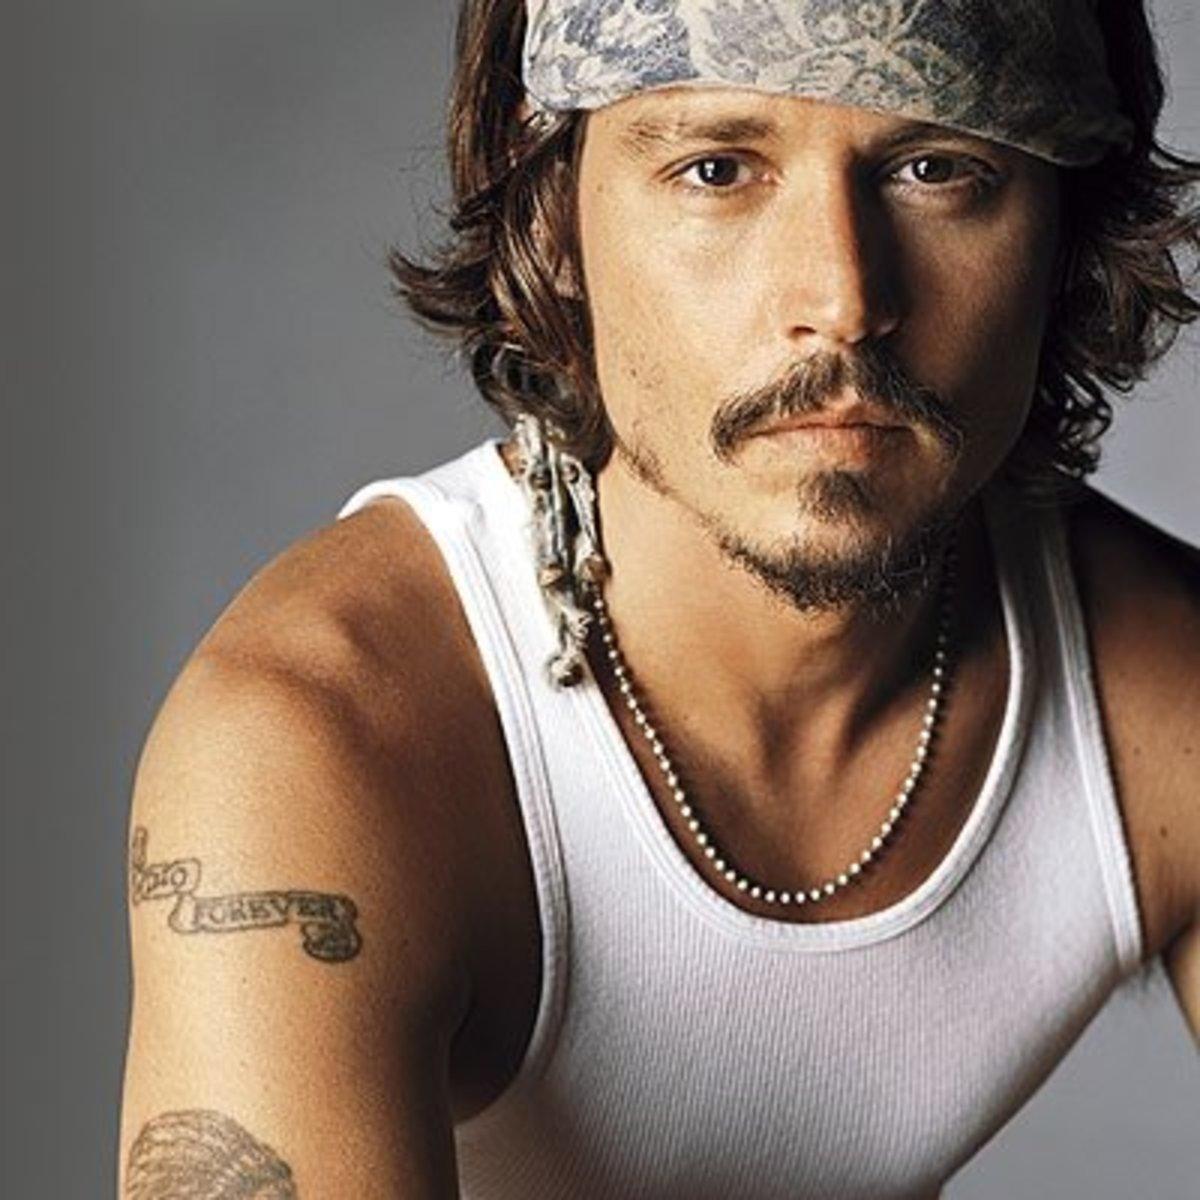 Johnny Depp was born in 1963